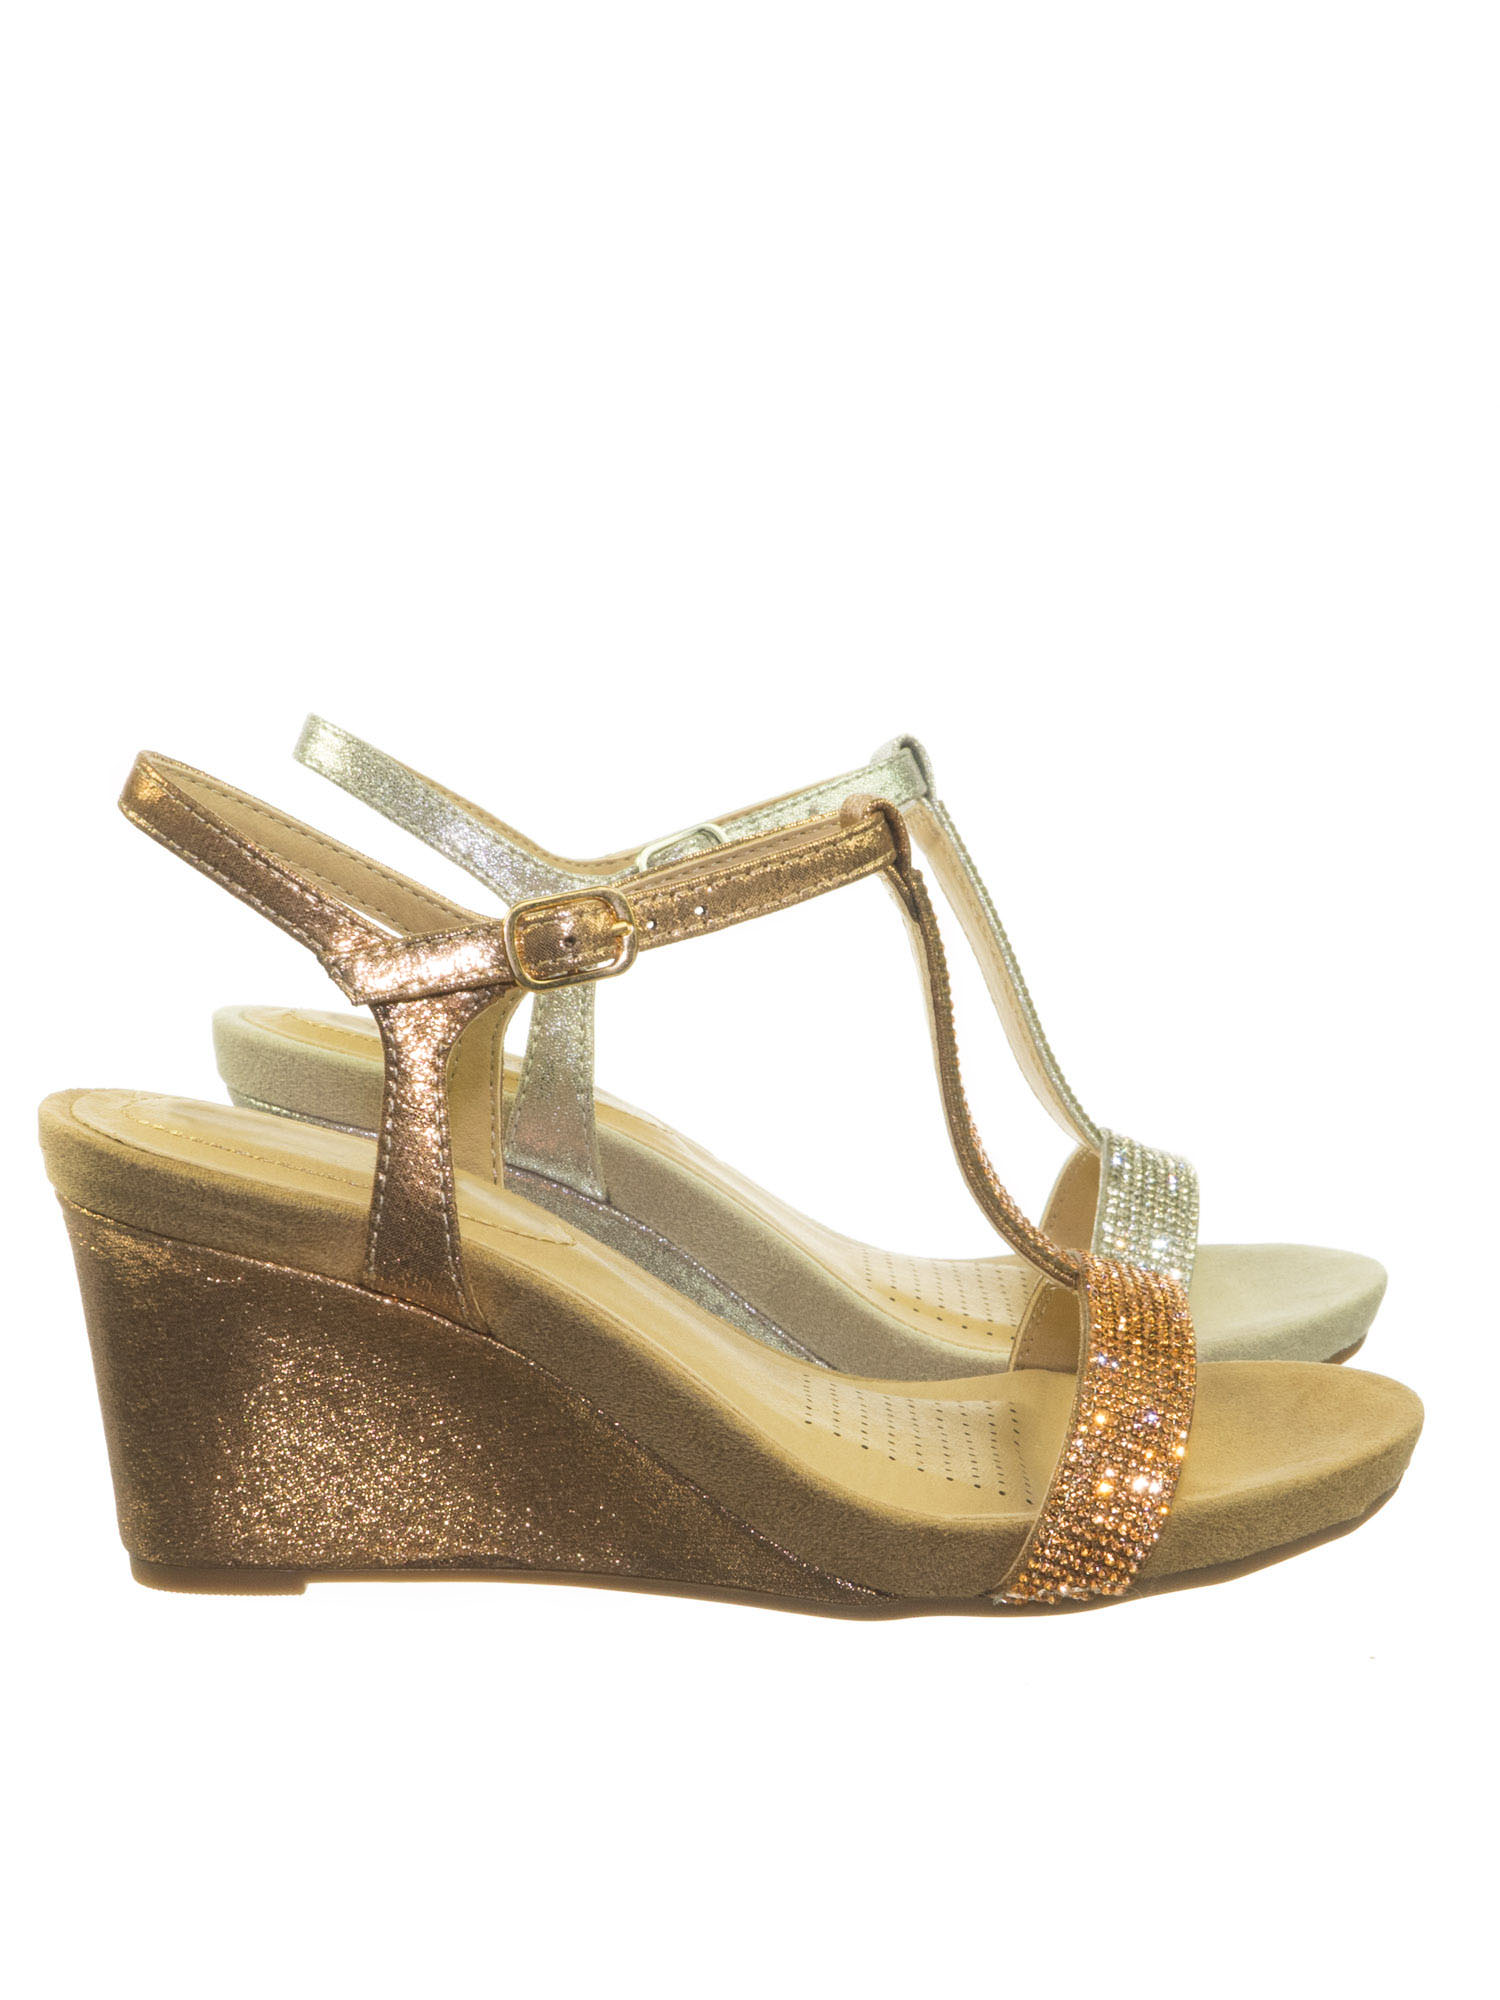 Maddox by City Classified, Comfort Foam Padded Wedge Rhinestone Crystal T-Strap Metallic Sandal